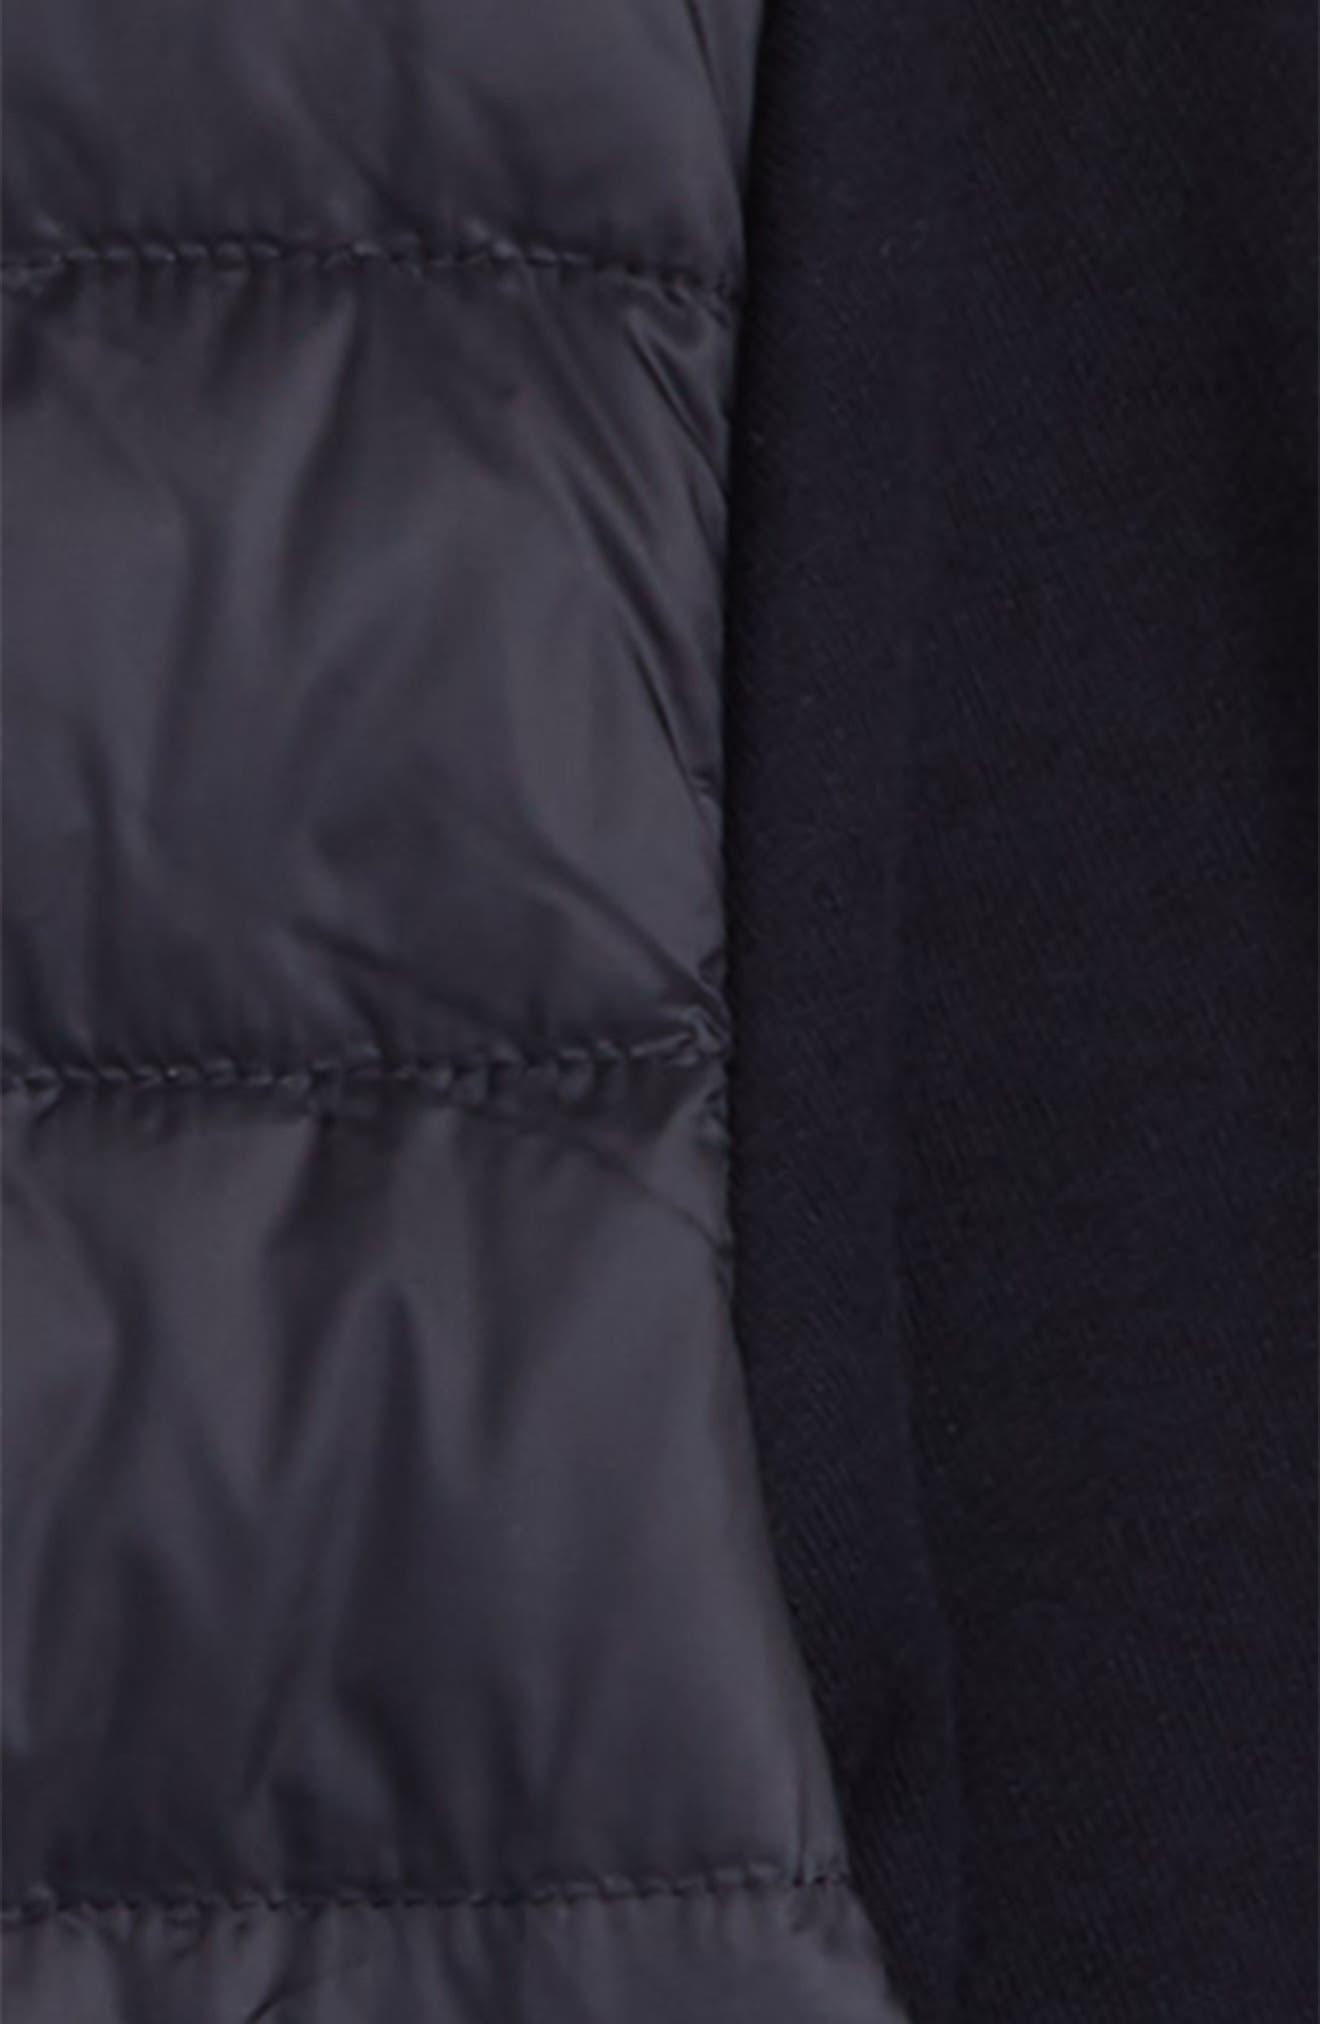 MONCLER, Hybrid Down Jacket, Alternate thumbnail 2, color, NAVY